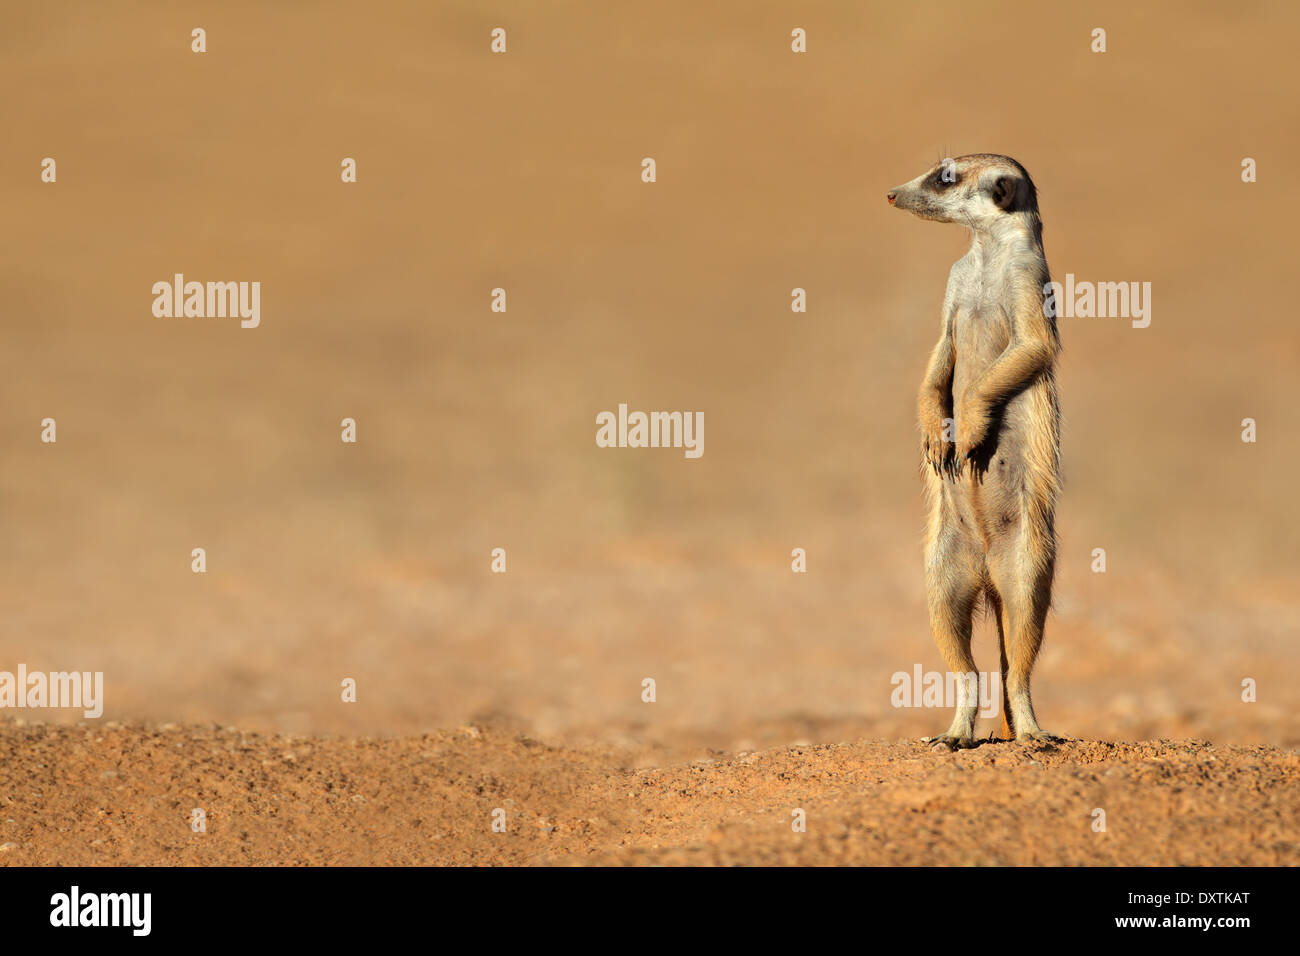 (Suricata suricatta suricata o alerta) en guardia permanente, el desierto de Kalahari, Sudáfrica Imagen De Stock